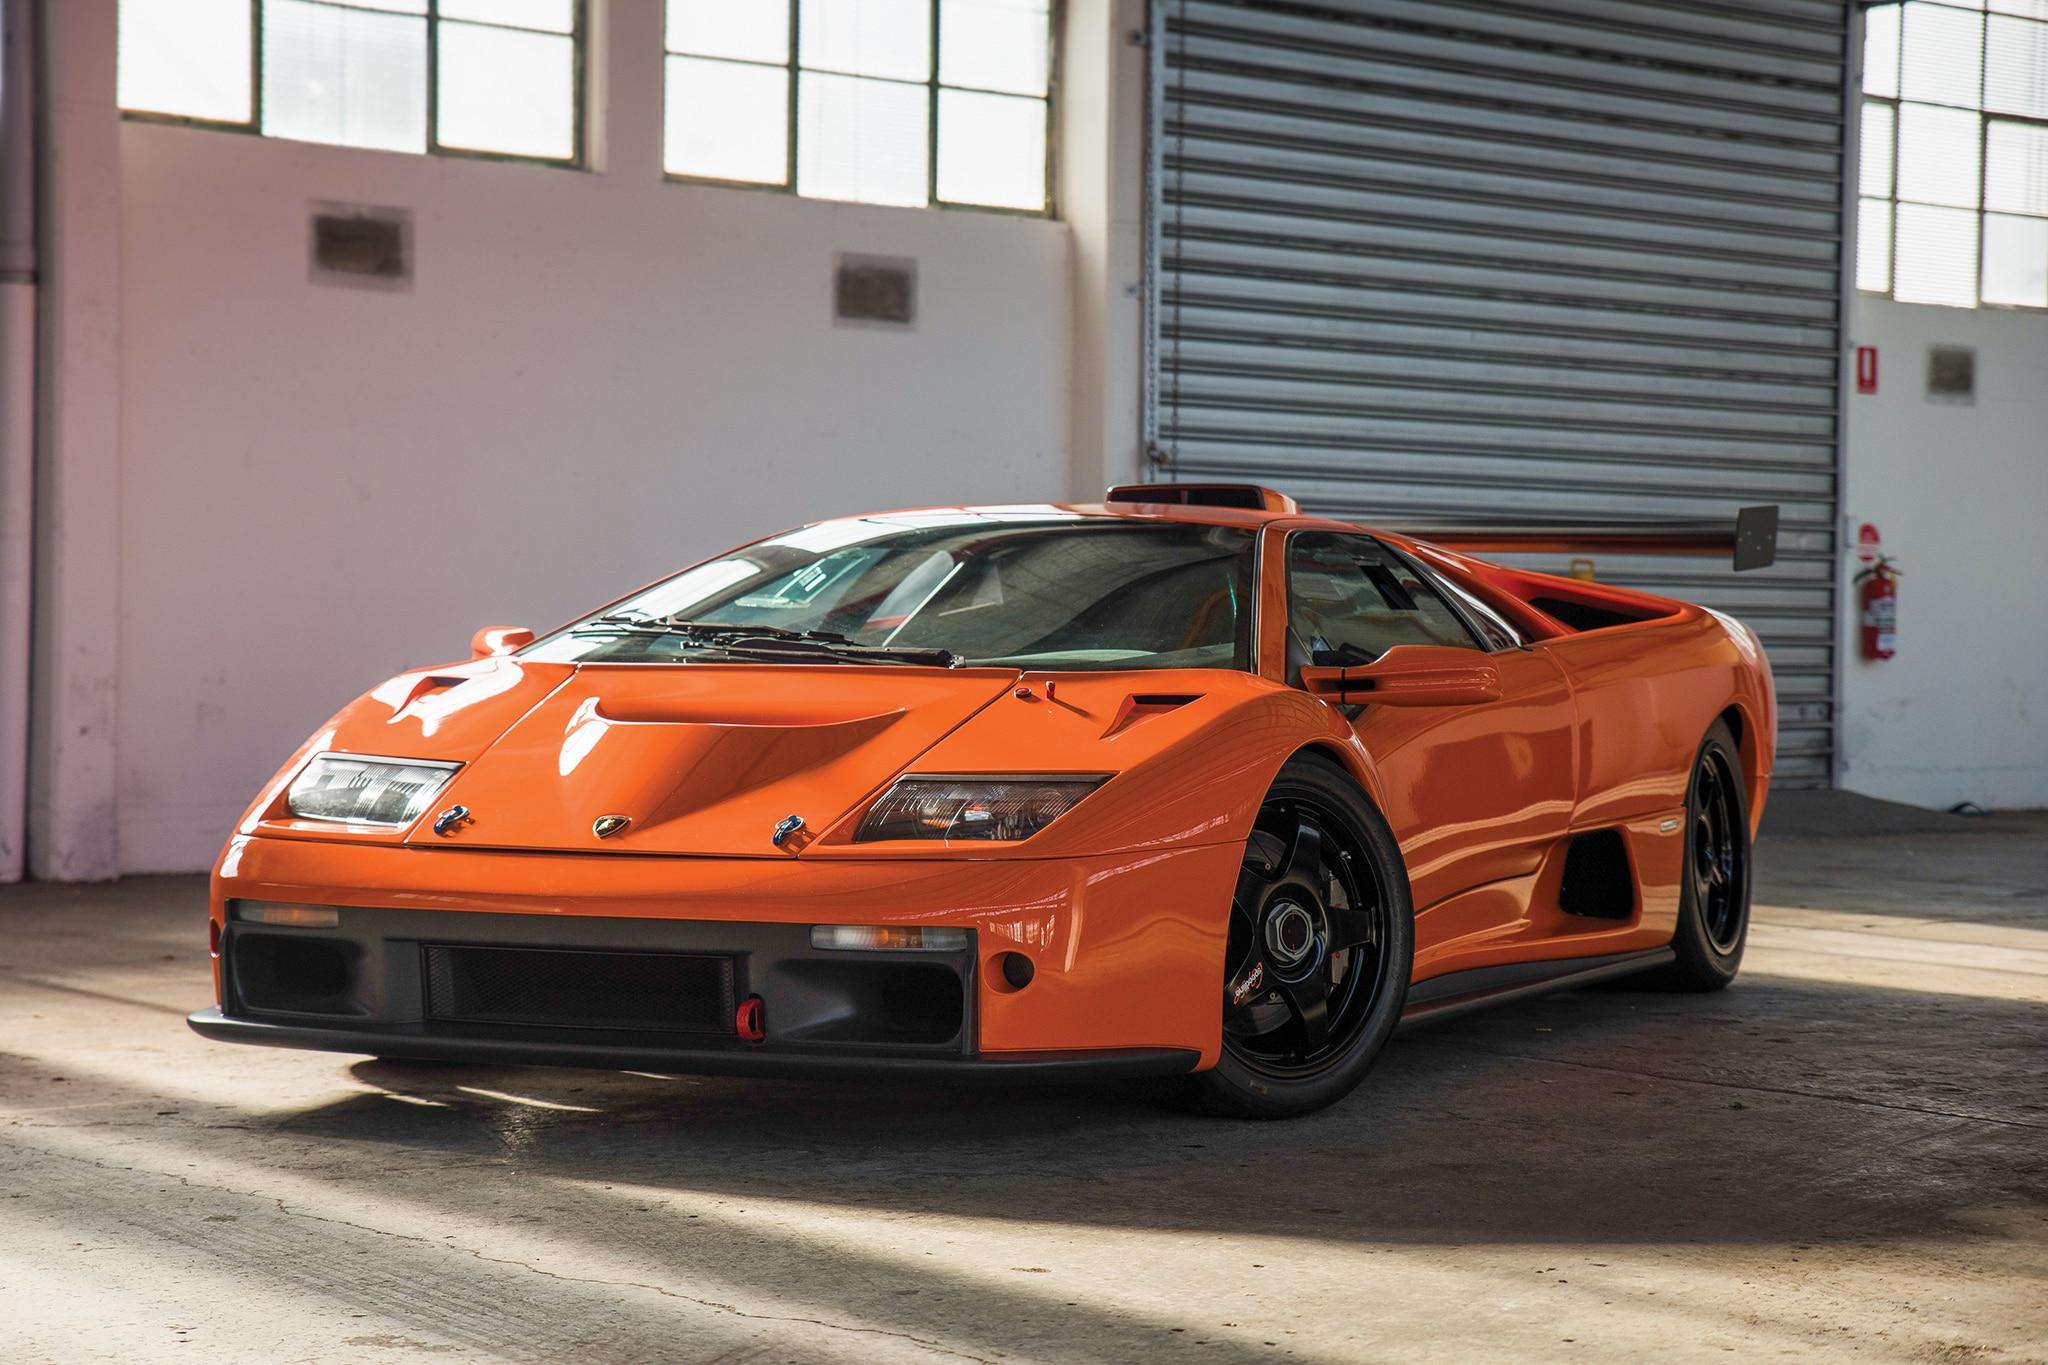 2000 Lamborghini Diablo GTR RM Sothebys Front Three Quarters